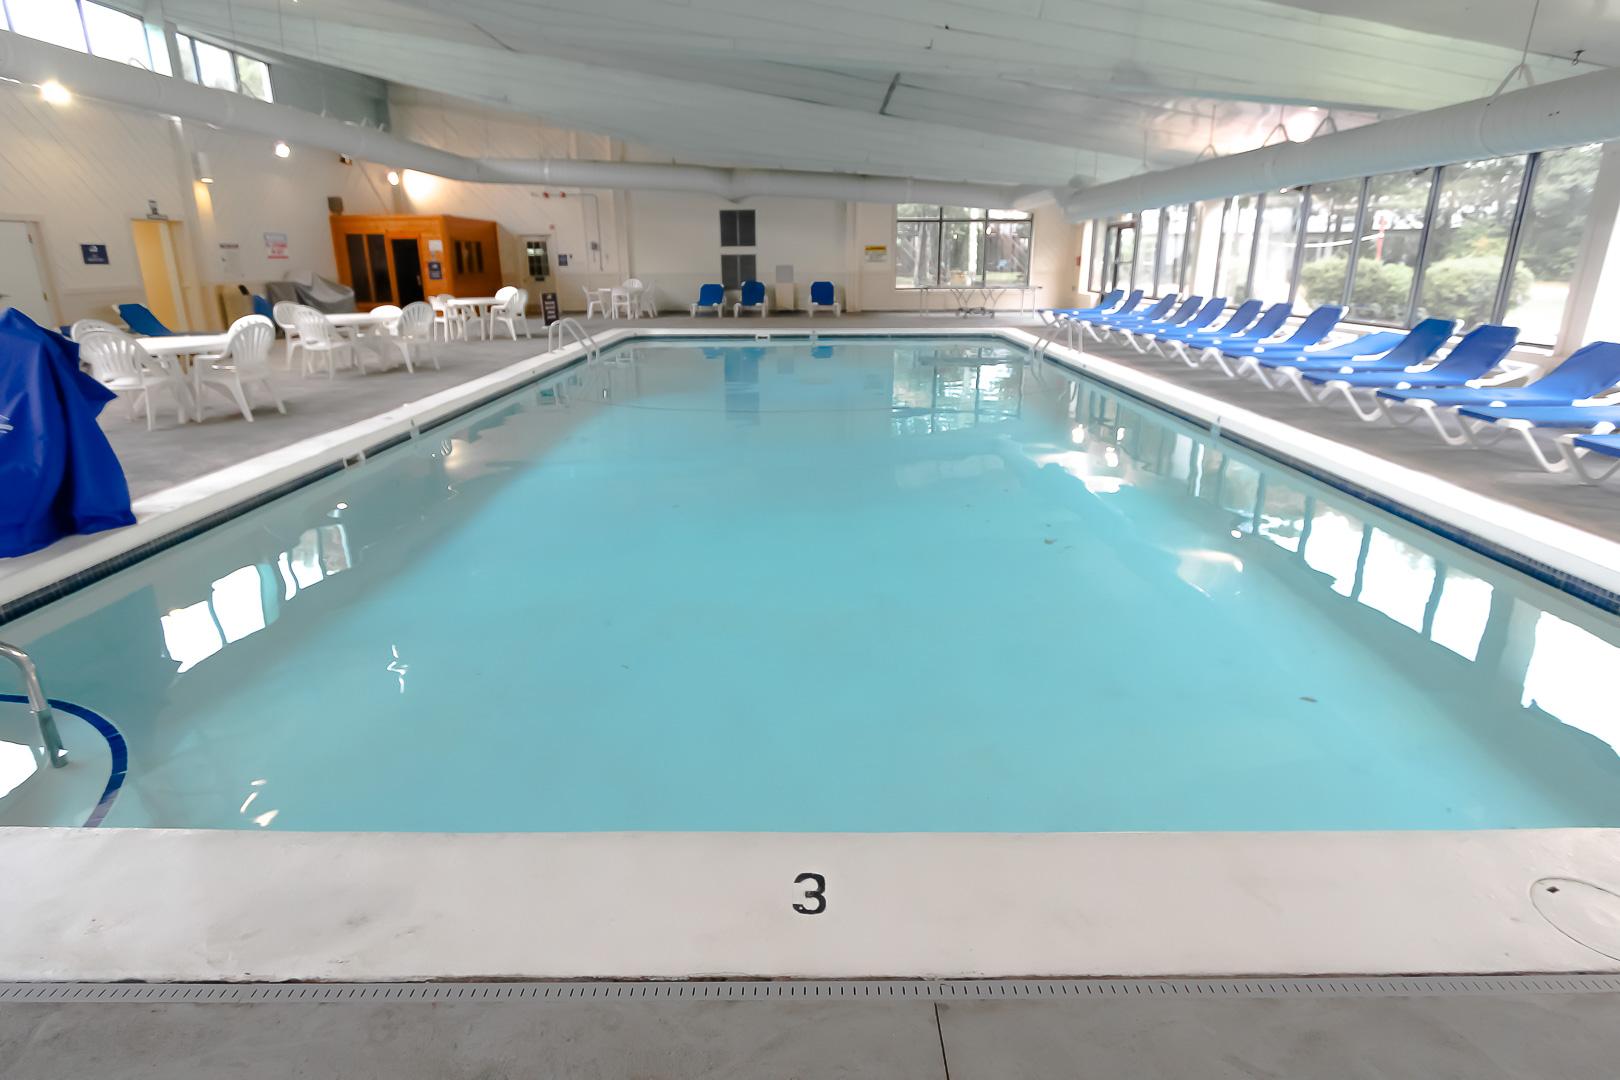 A cozy indoor swimming pool at VRI's Sea Mist Resort in Massachusetts.